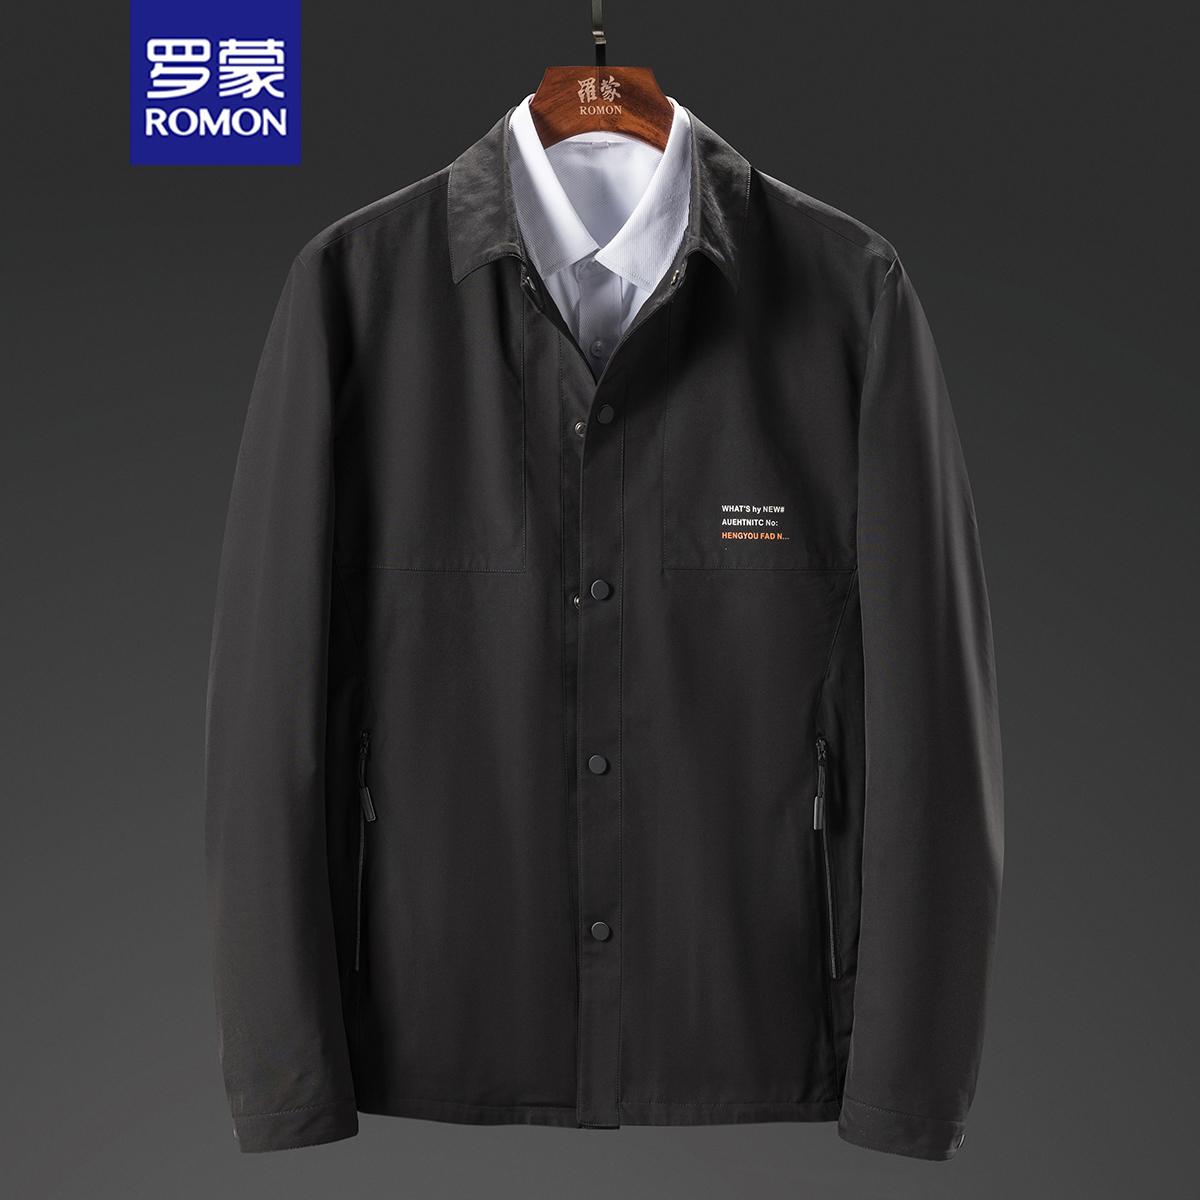 Romon mens solid color fashion jacket casual coat sports baseball collar mens coat 88m2069